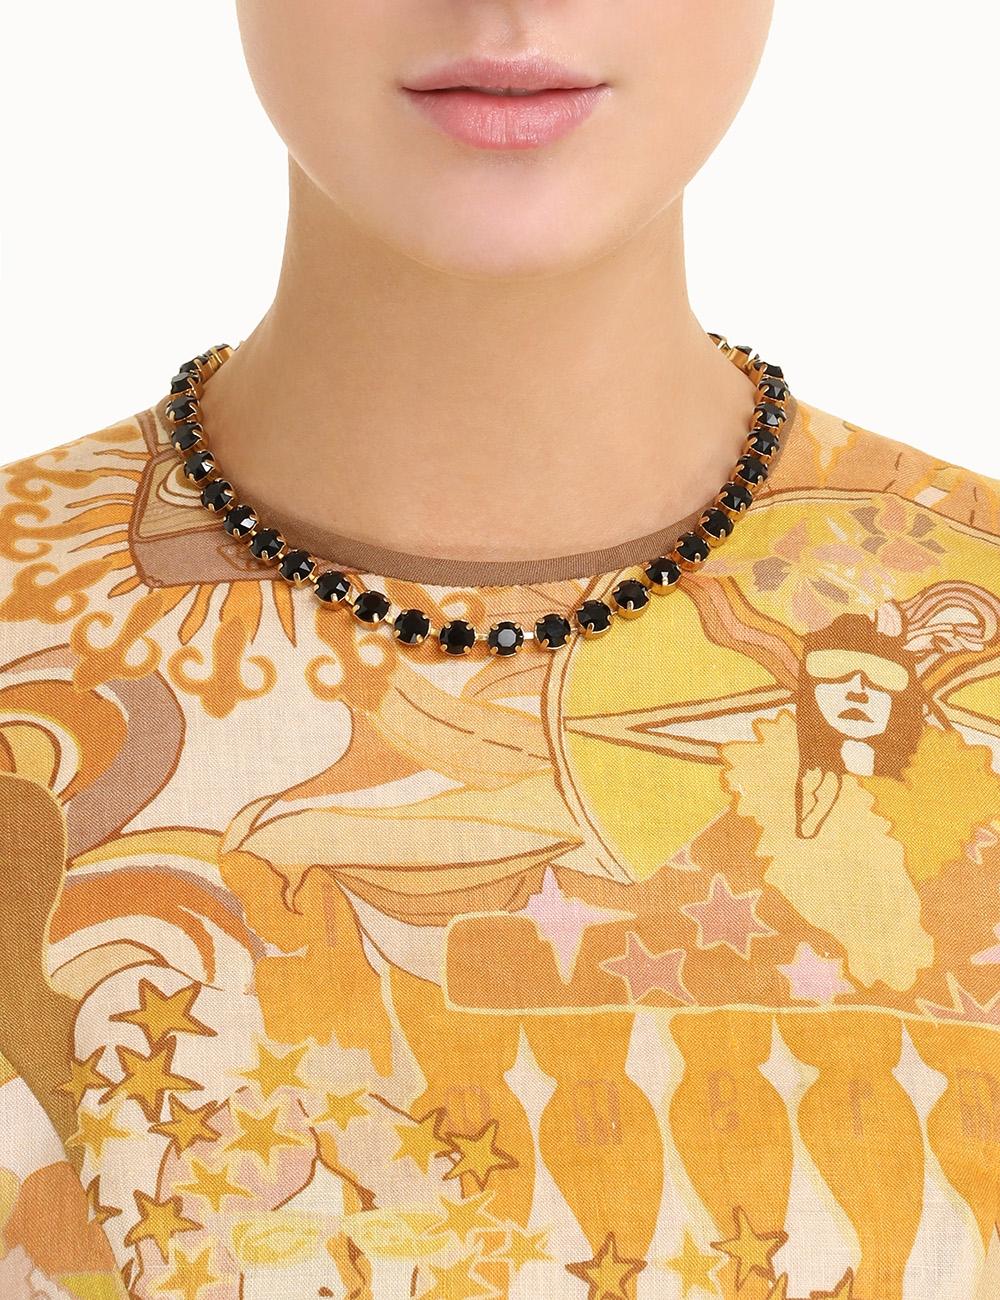 Crystal Tennis Necklace